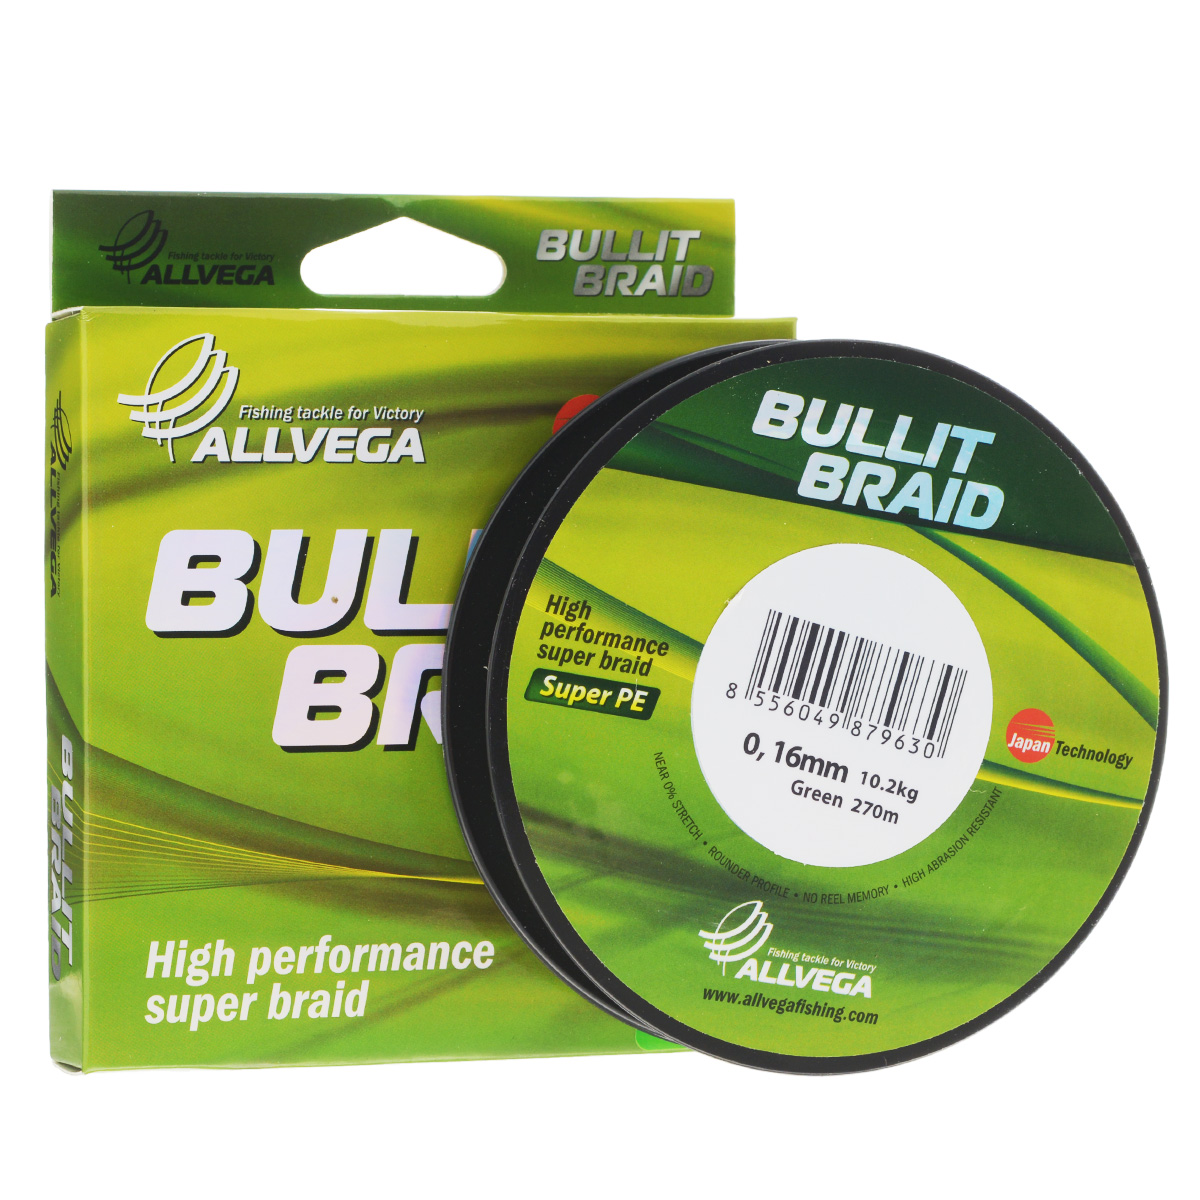 Леска плетеная Allvega Bullit Braid, цвет: темно-зеленый, 270 м, 0,16 мм, 10,2 кг